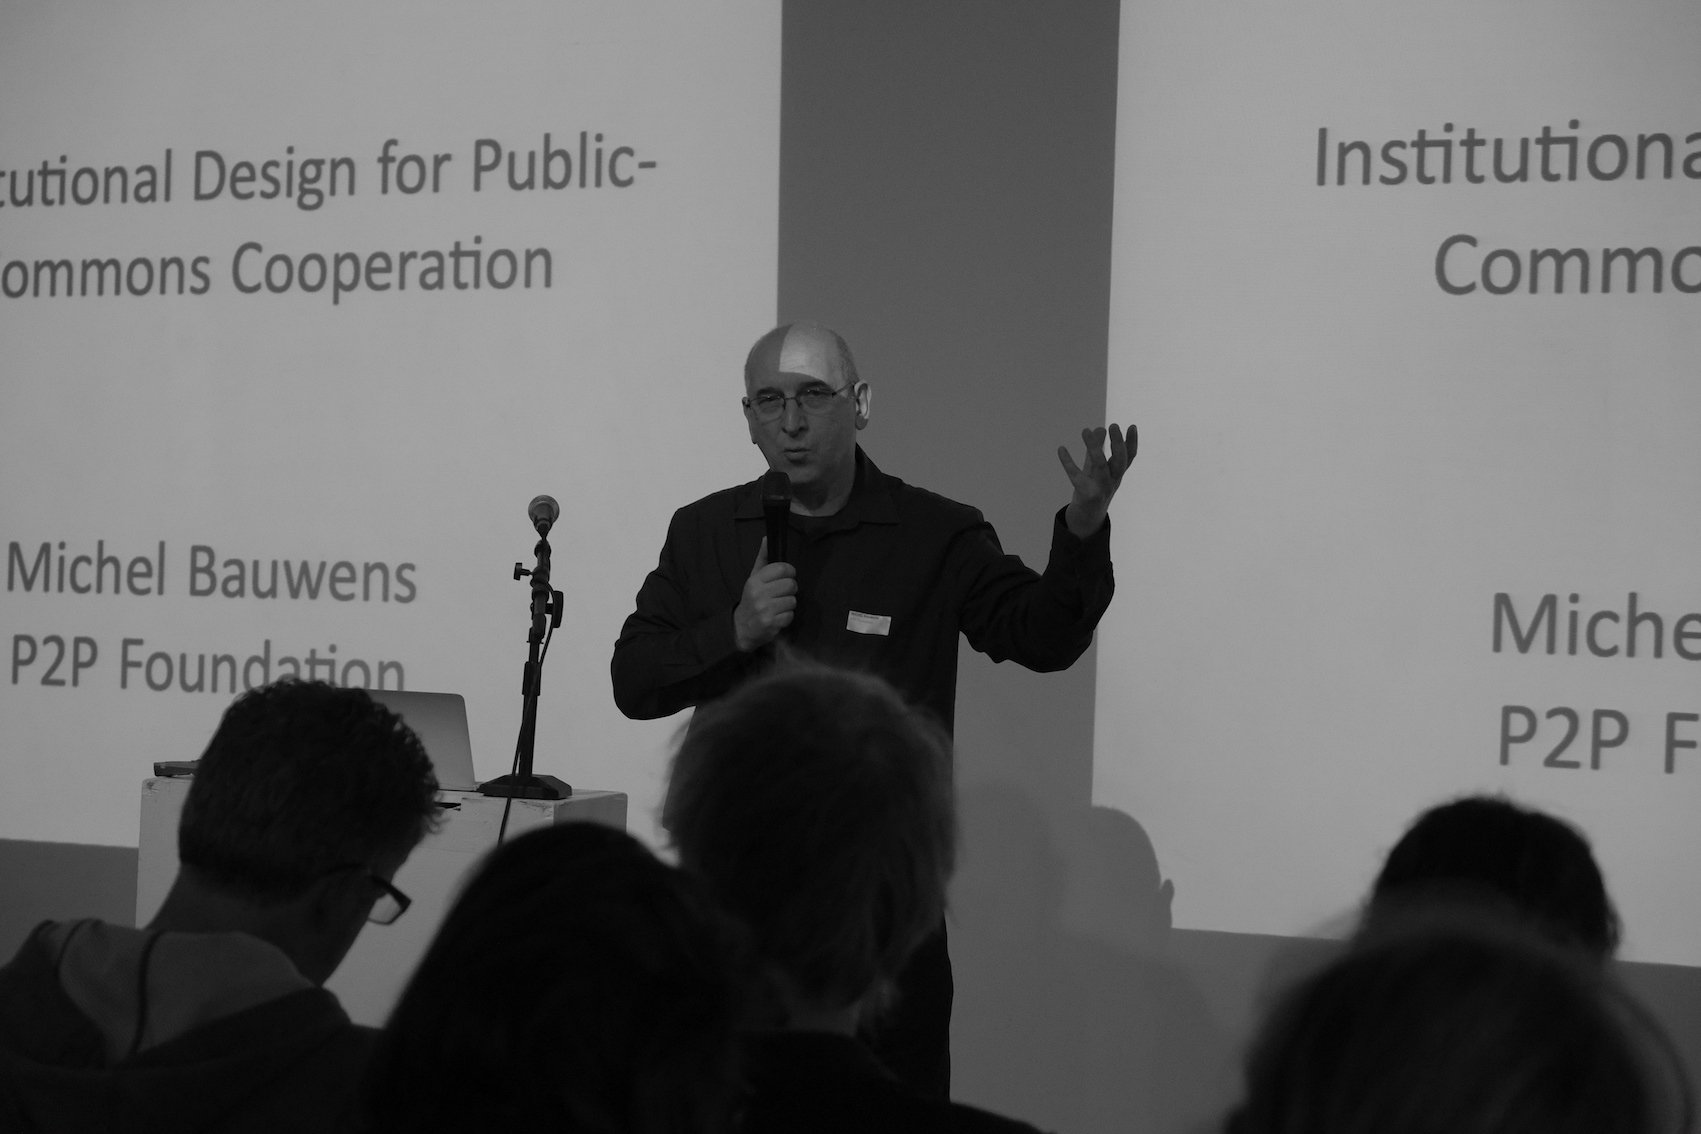 Keynote by Michel Bauwens, P2P Foundation. Photo: Cindy Kohtala.